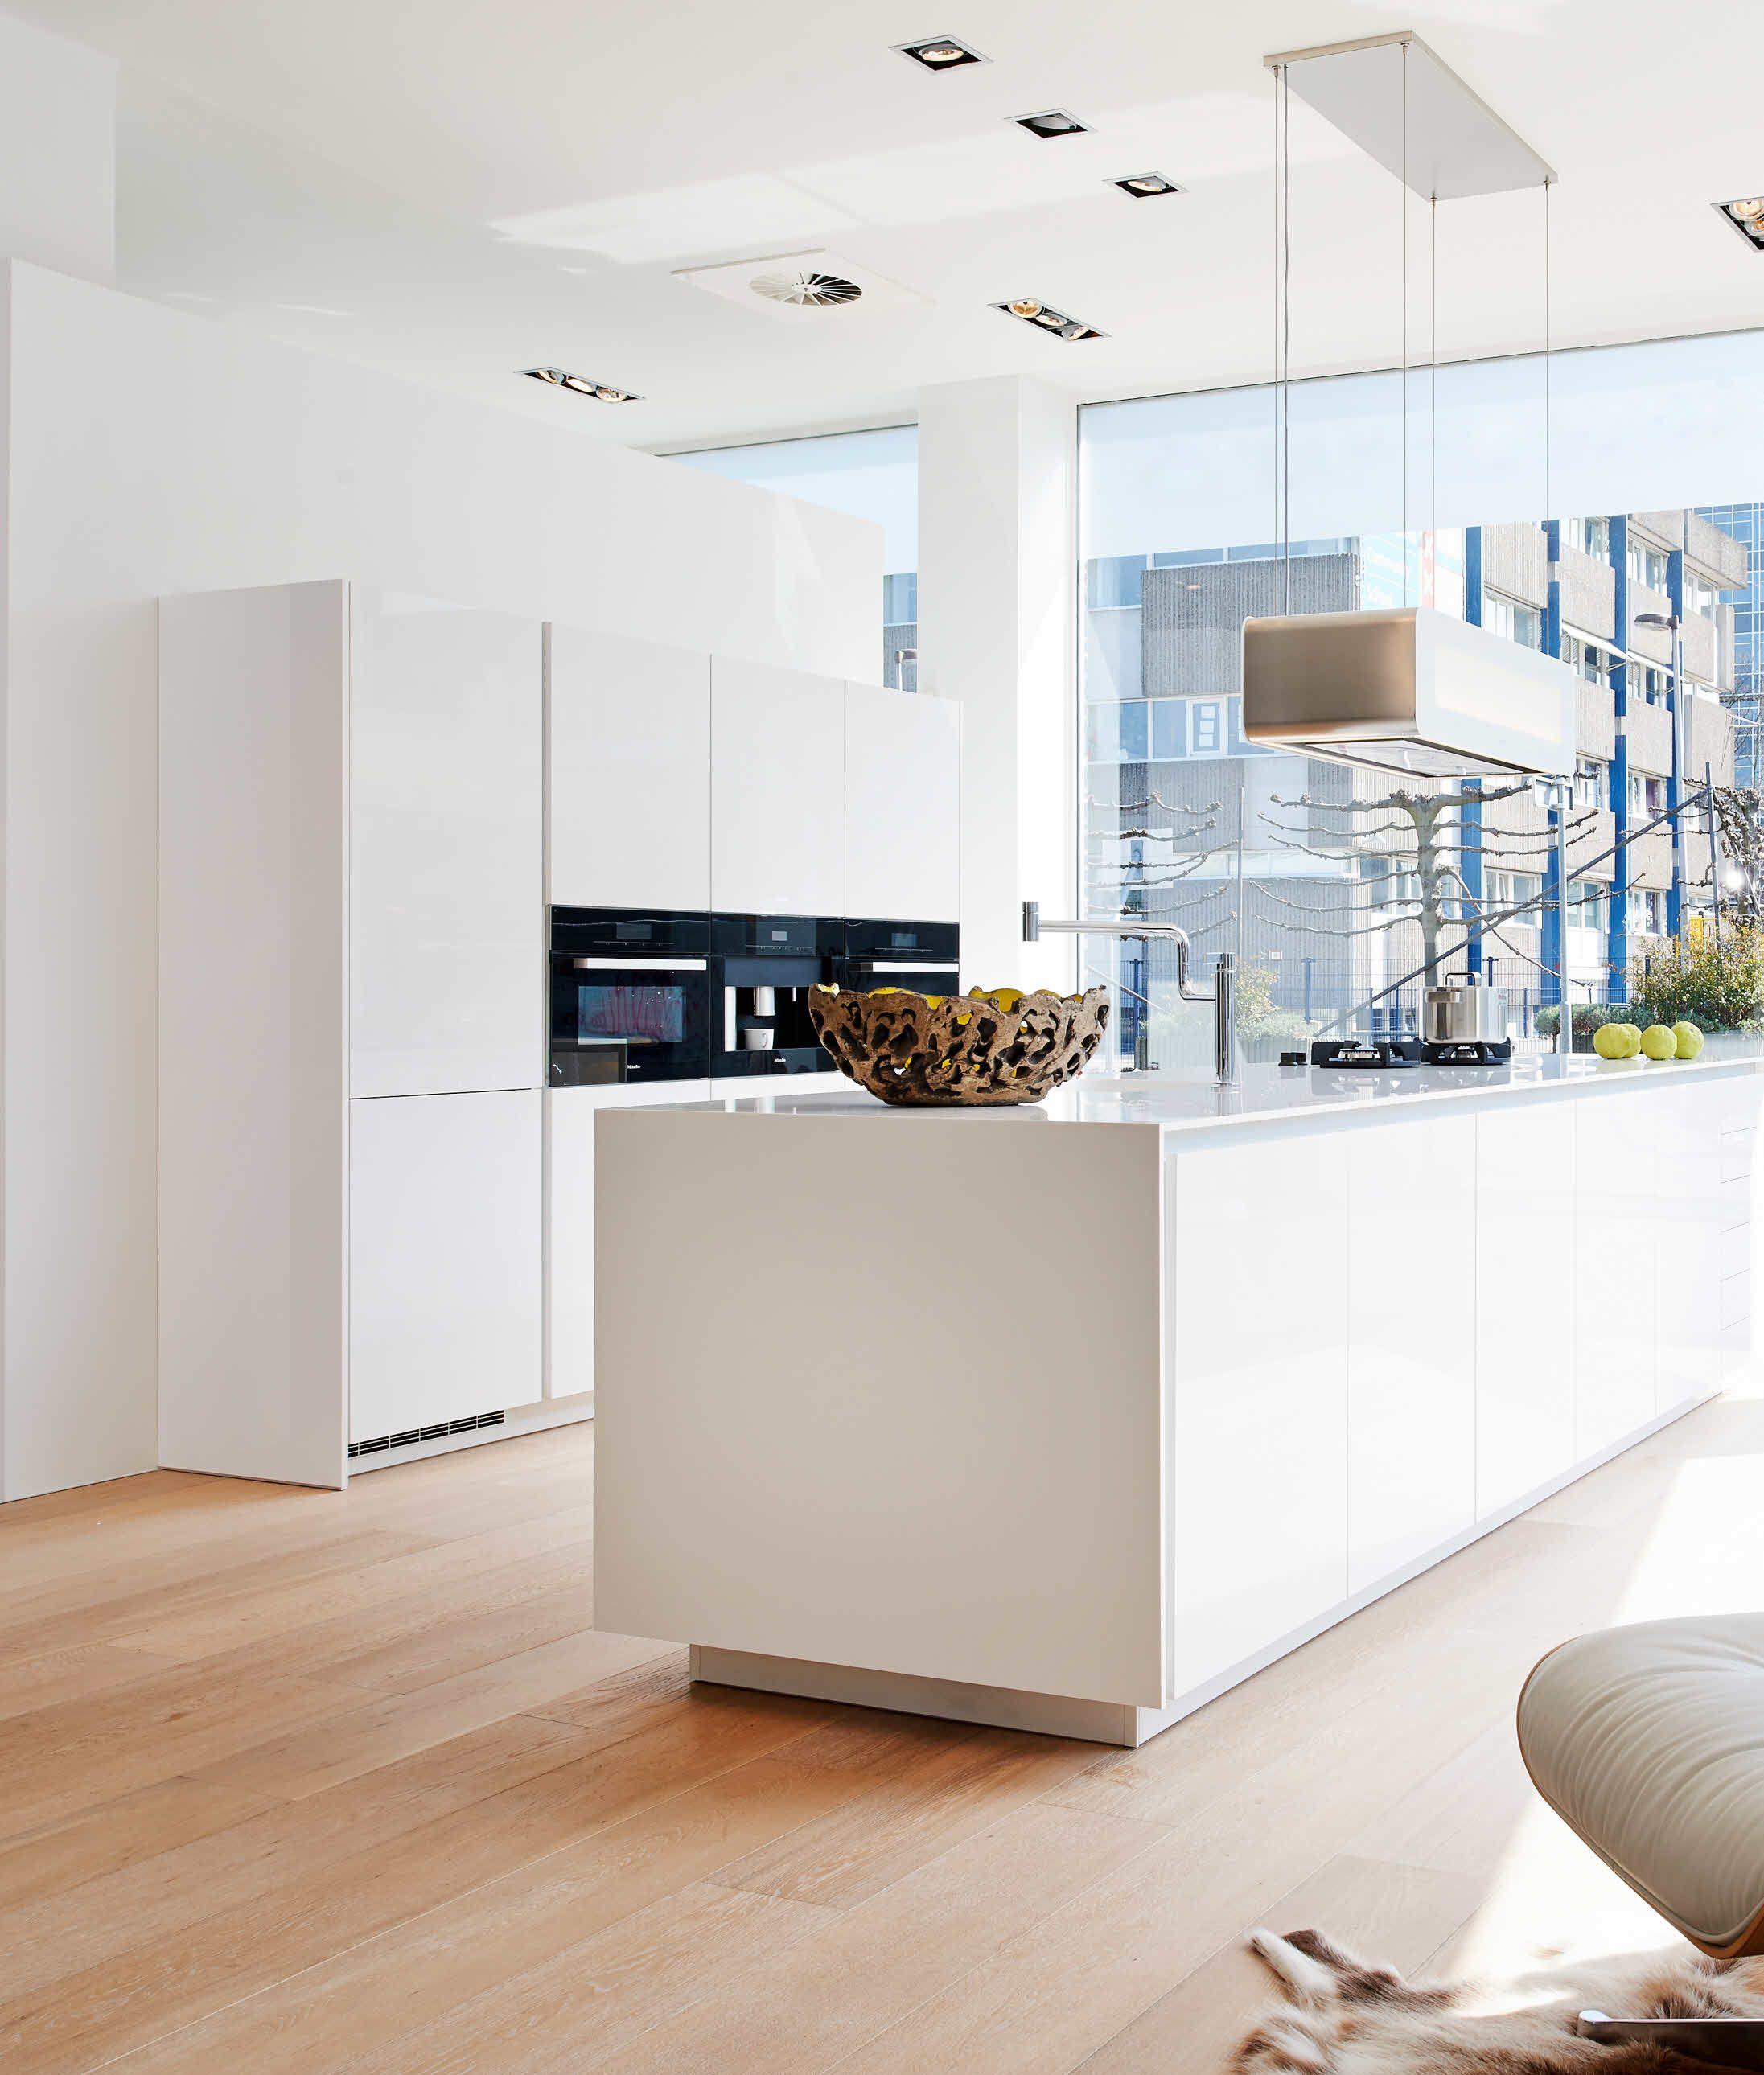 Poggenpohl kitchen studio amsterdam interior shot for Casa minimalista rosario